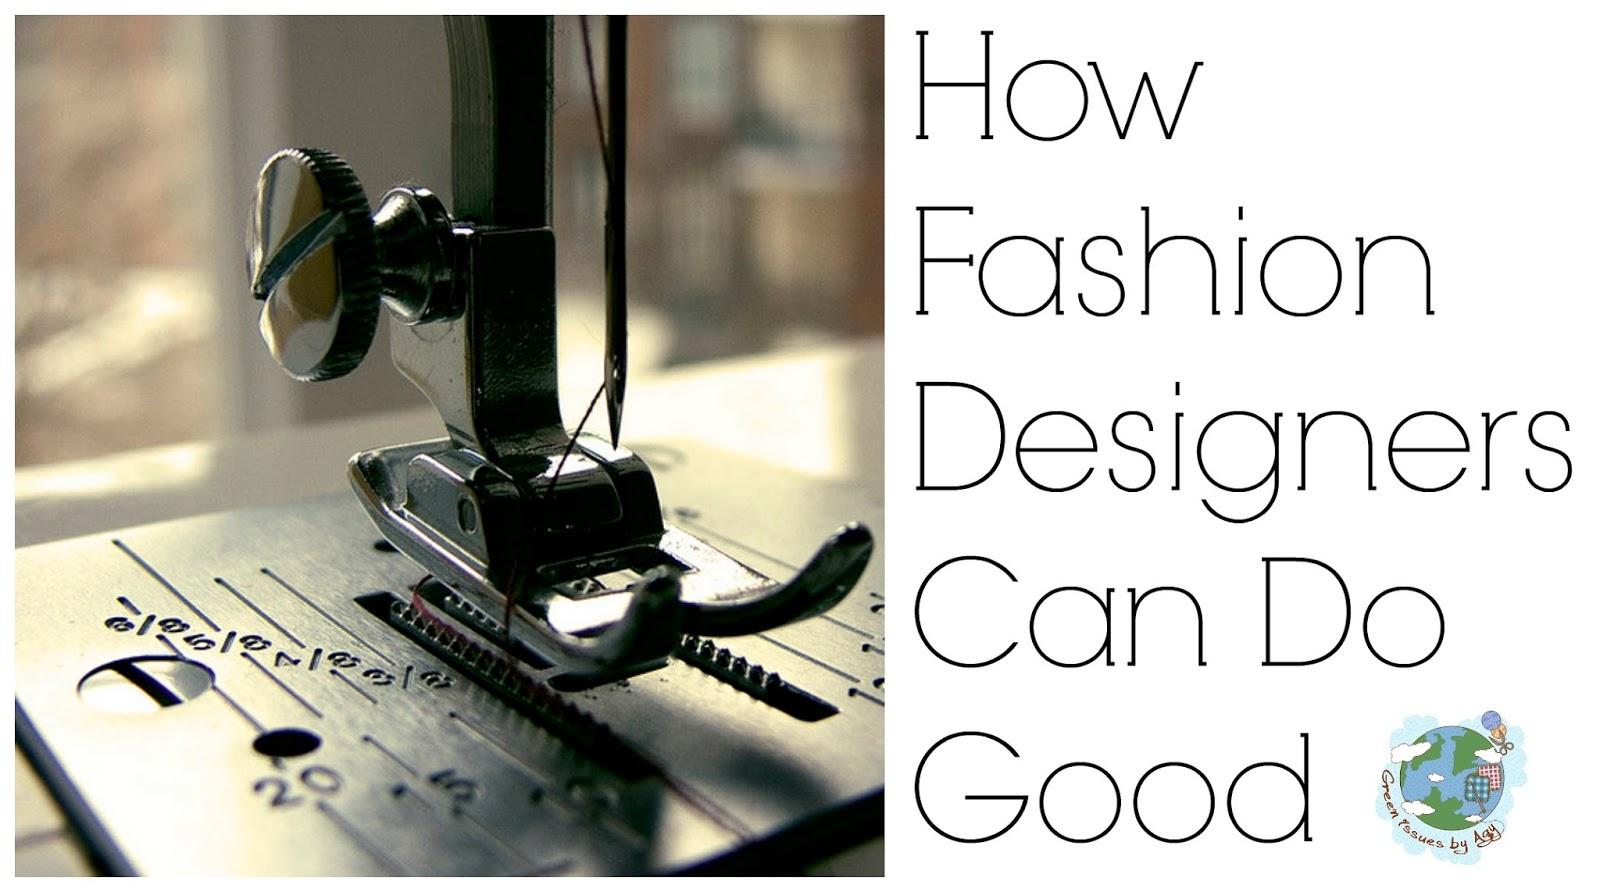 Fashion Designers Do Good